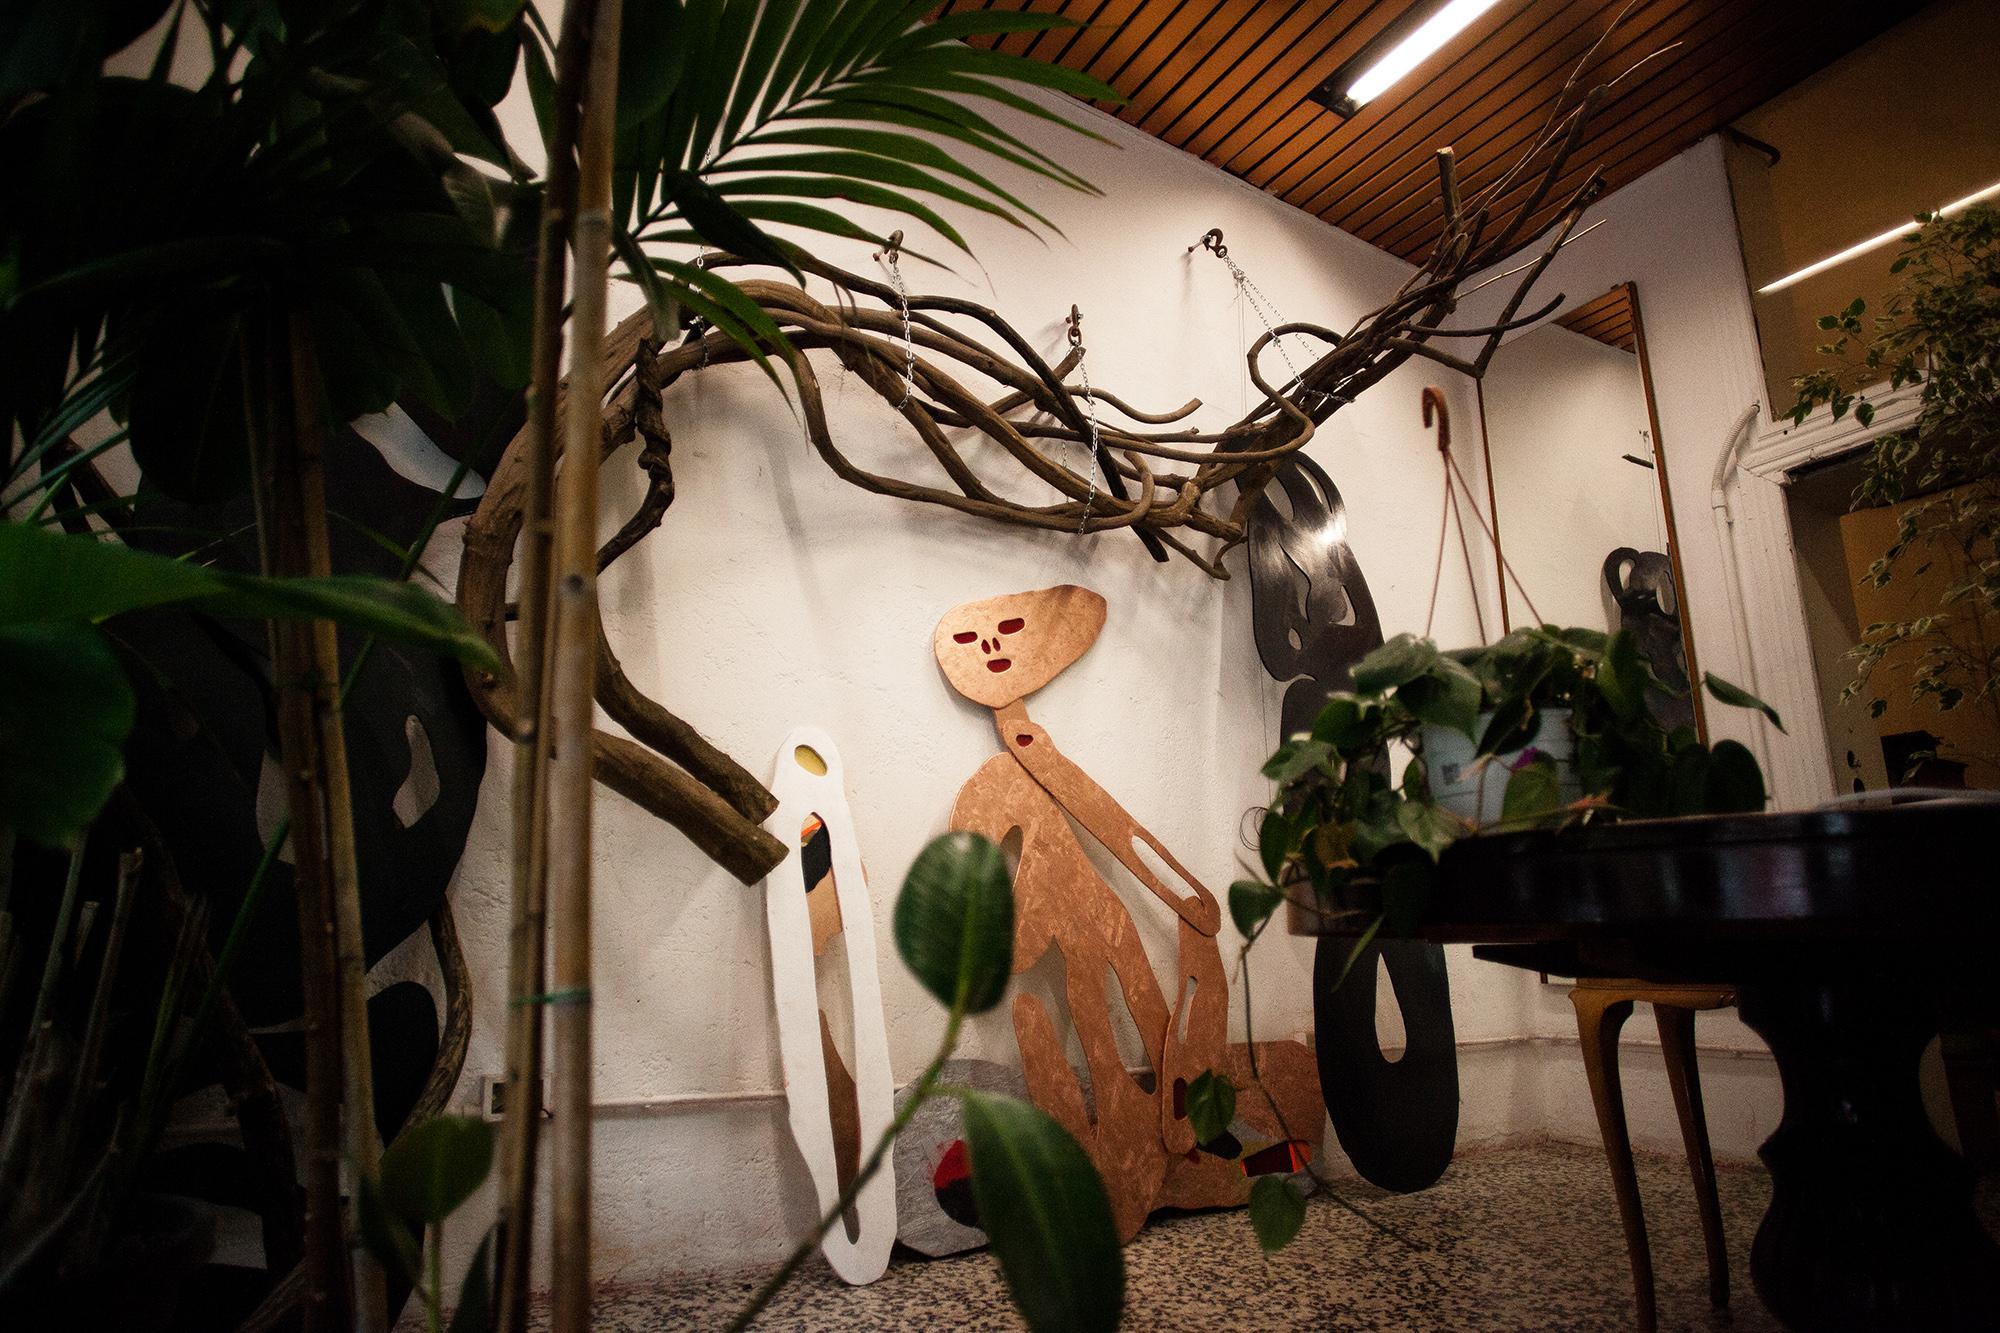 Wisteria Autogena Odd Garden Giorgio Bartocci Matteo Foschi